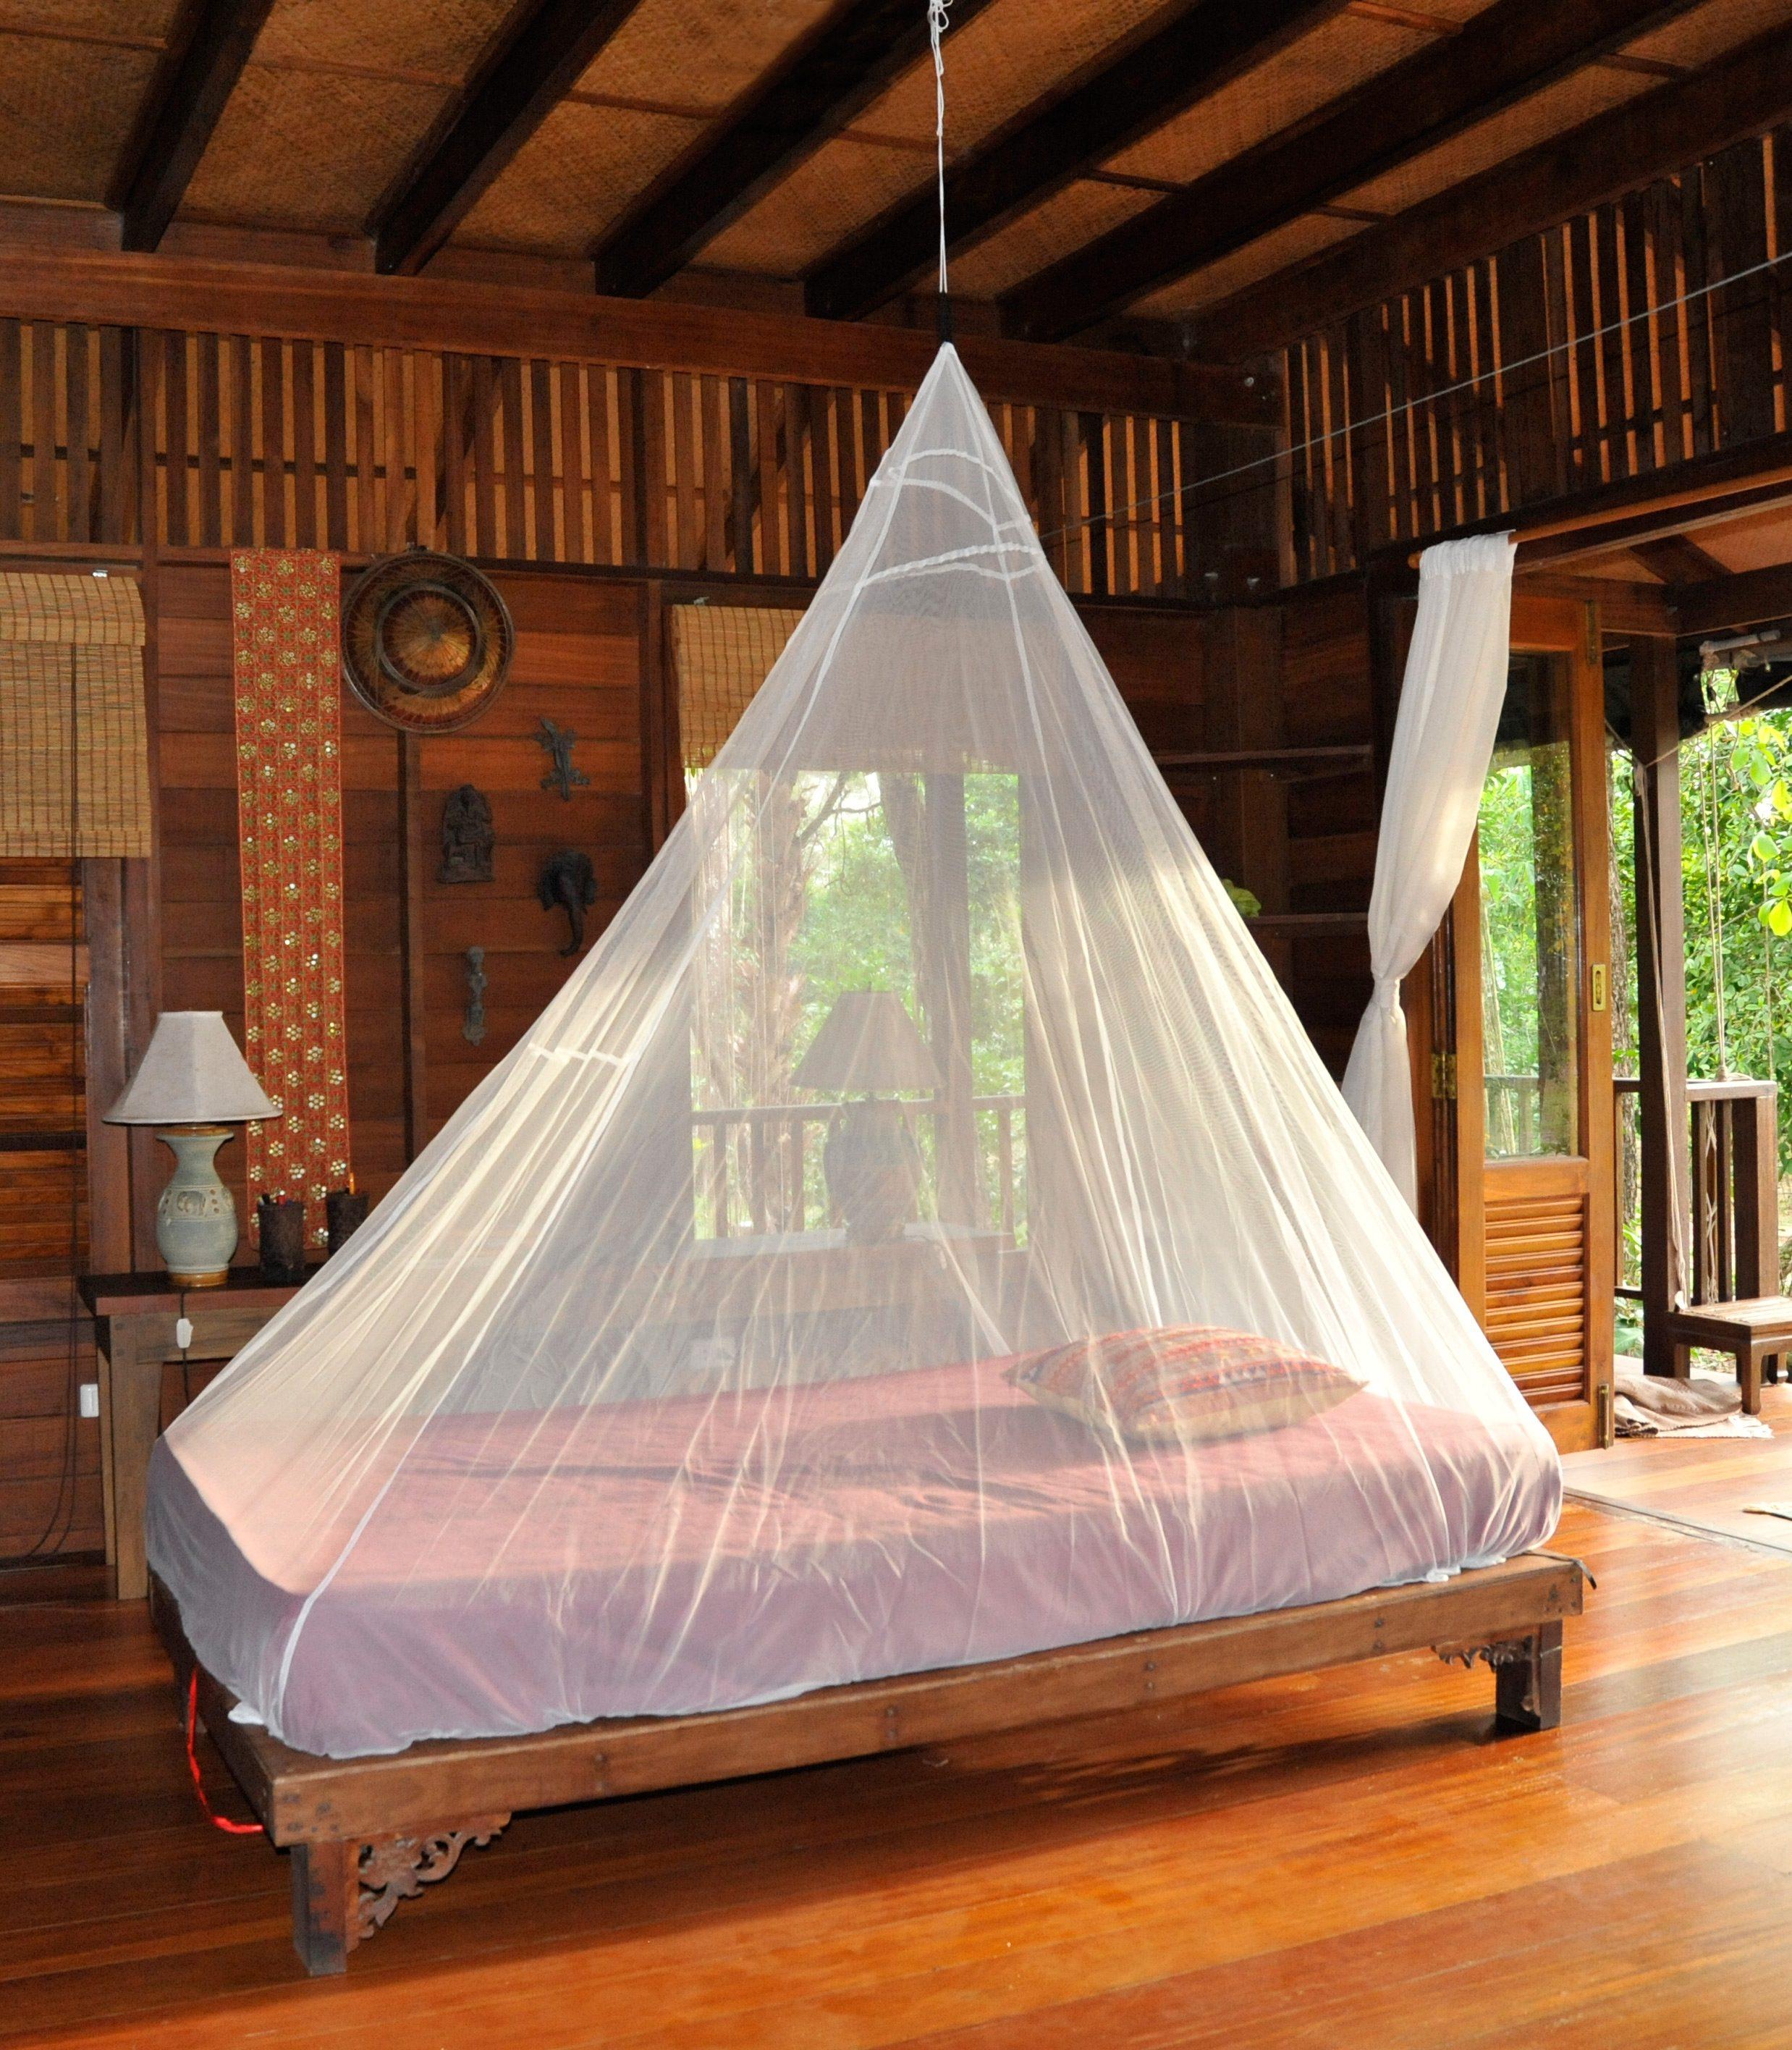 Cocoon Zeltzubehör »Mosquito Travel Net Single«